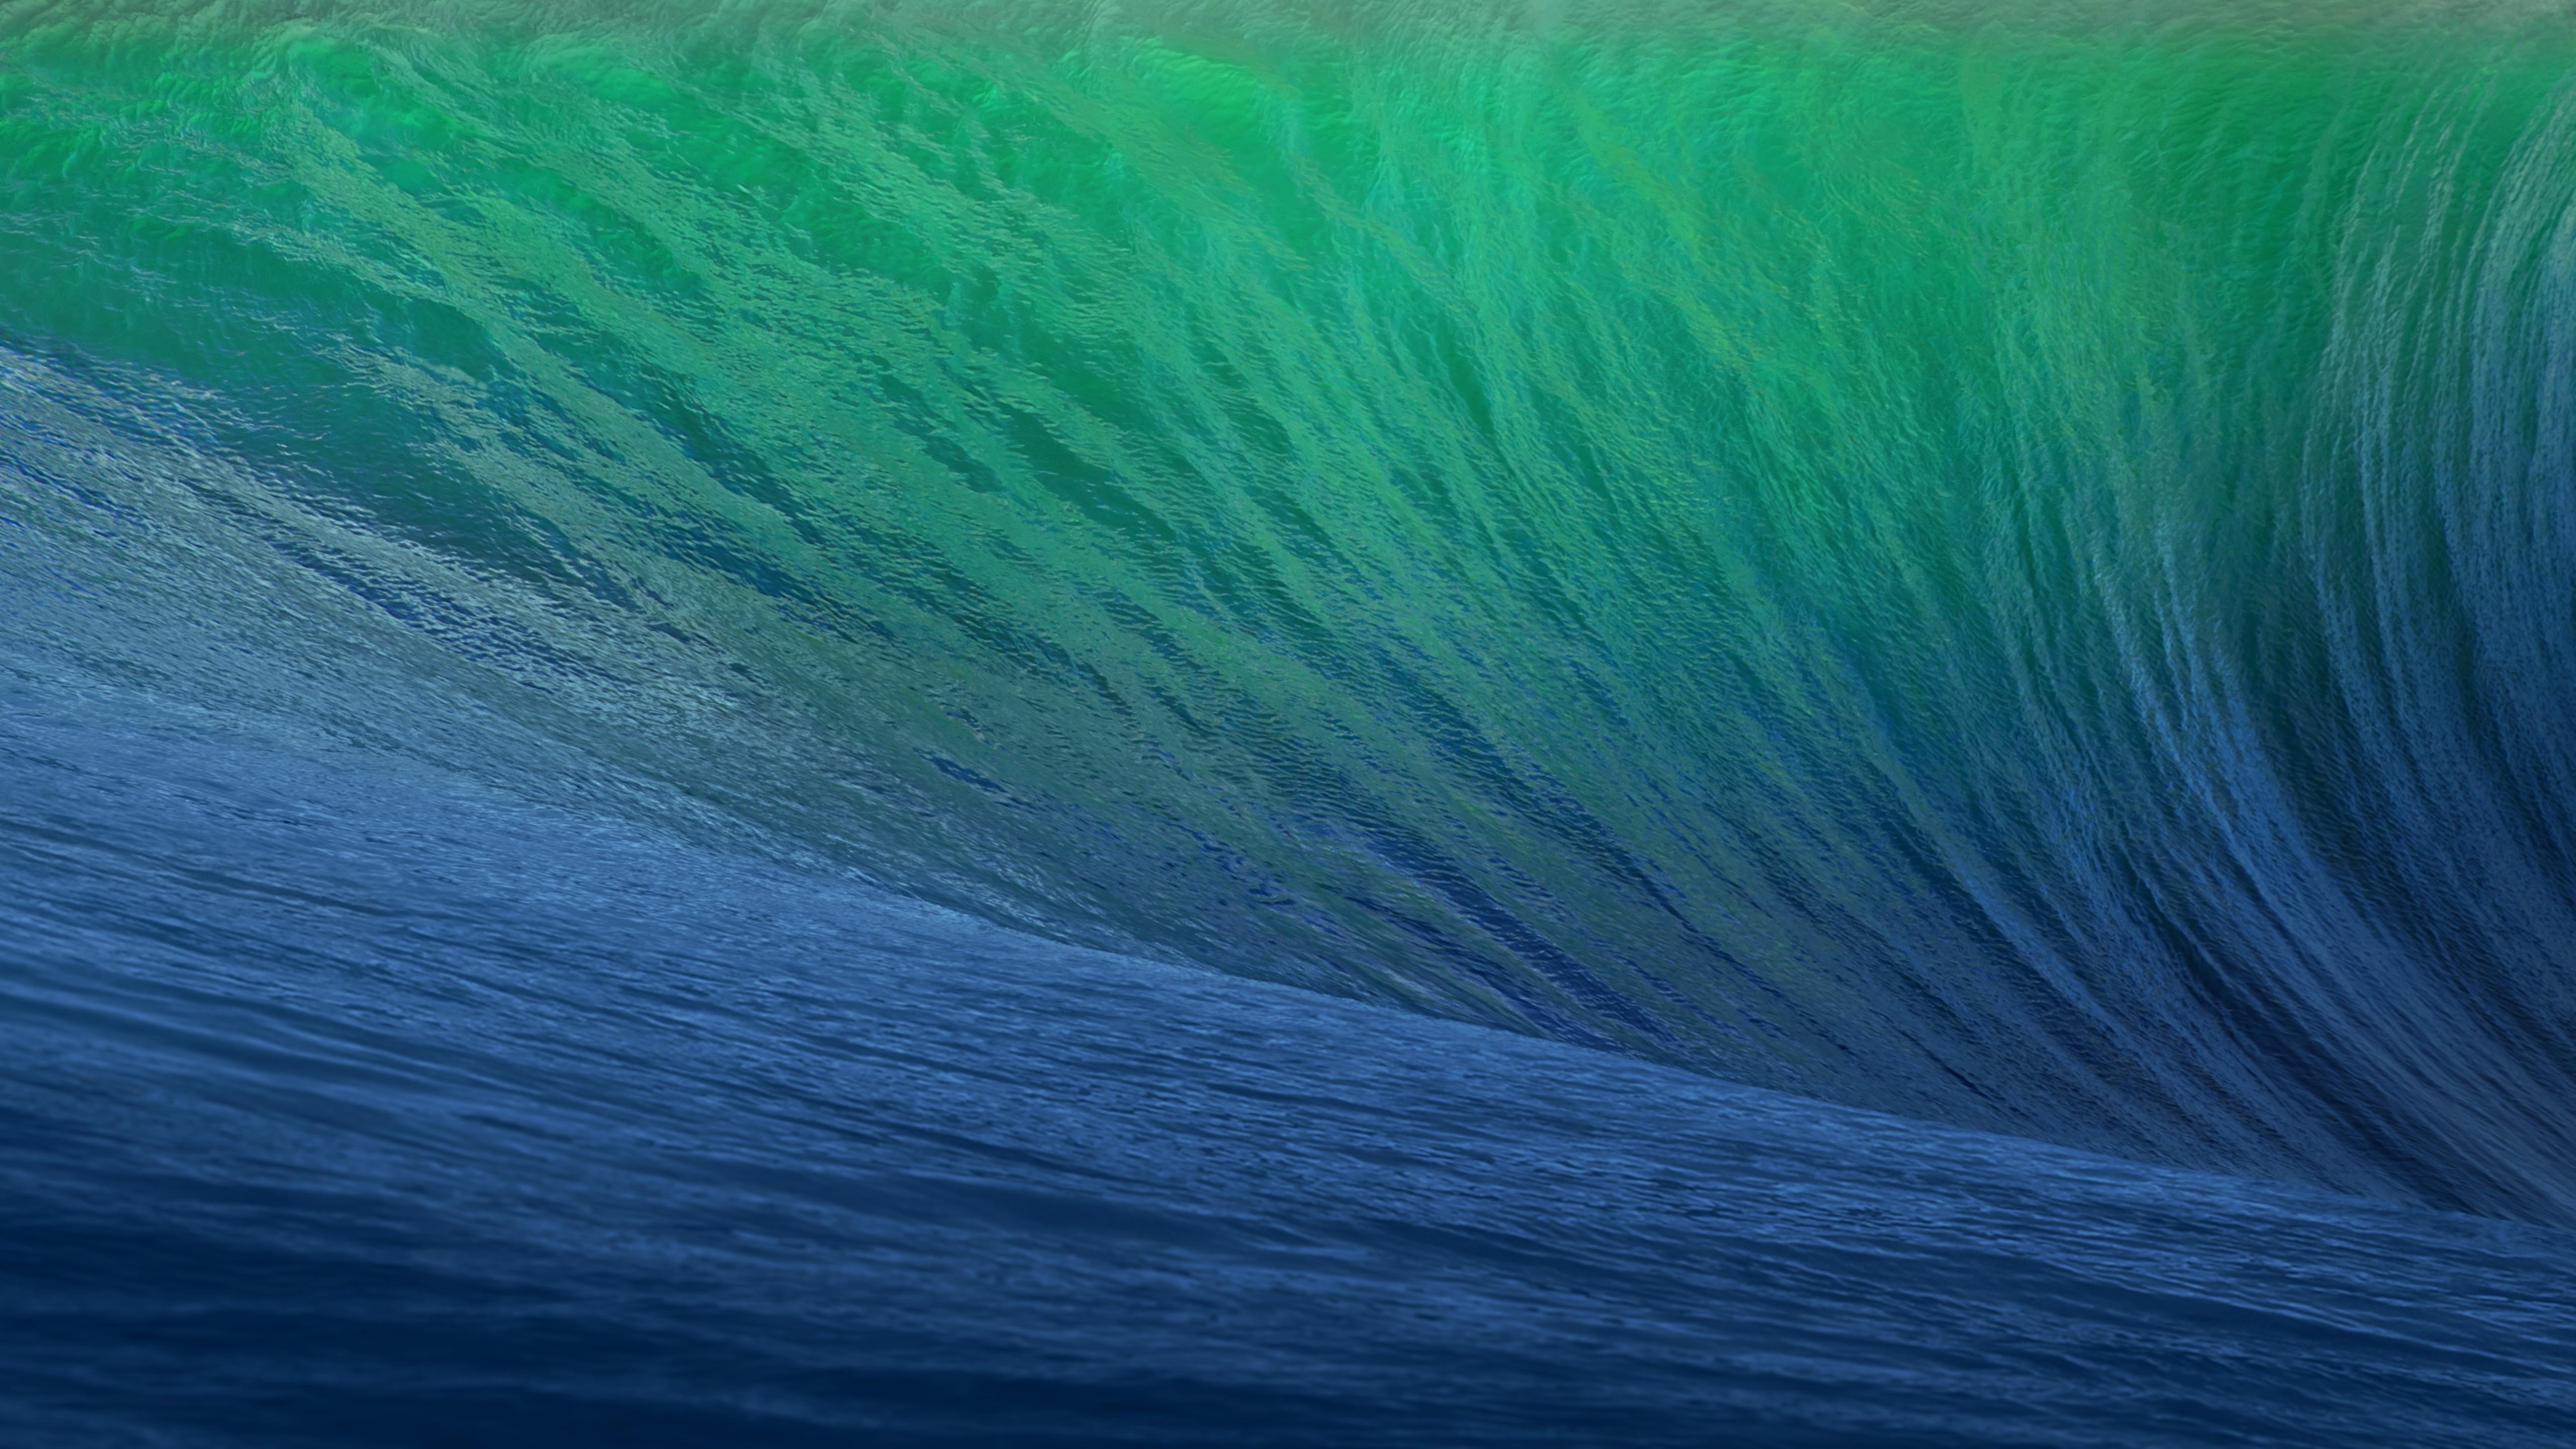 Popular Wallpaper Mac Blue - osx-5120x2880-5k-4k-wallpaper-8k-wave-blue-big-178  Pic_628957.jpg